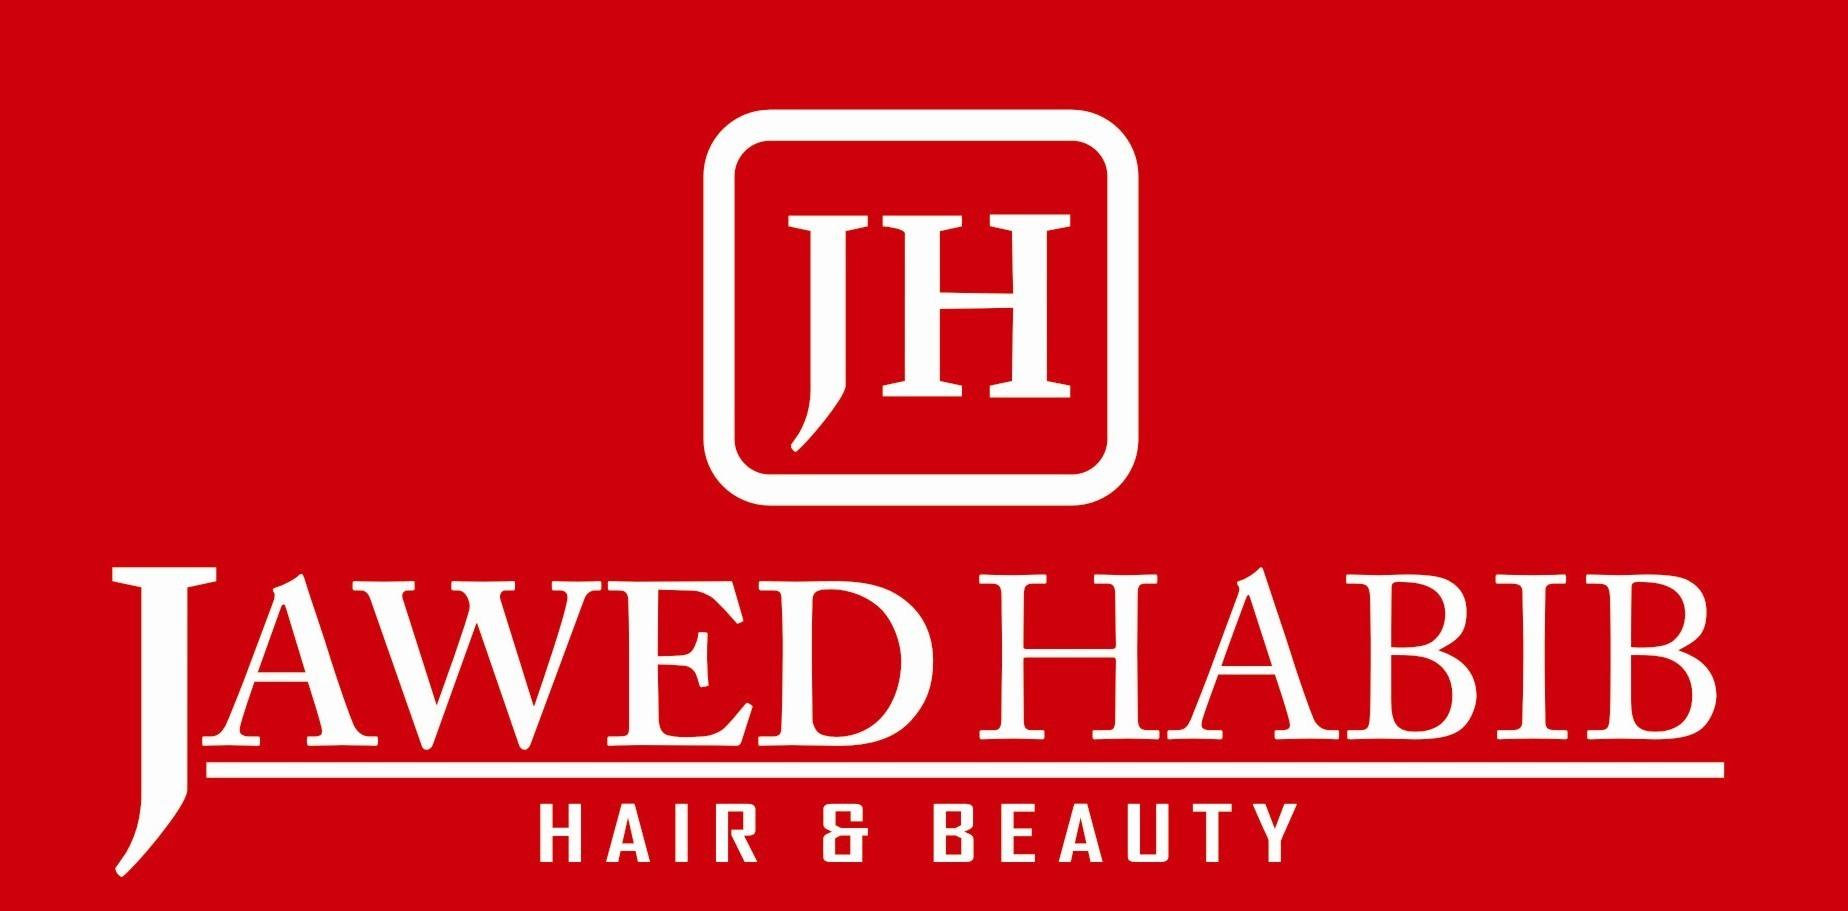 Jawed Habib Hair & Beauty Salons - Concord Lane - Baroda Image